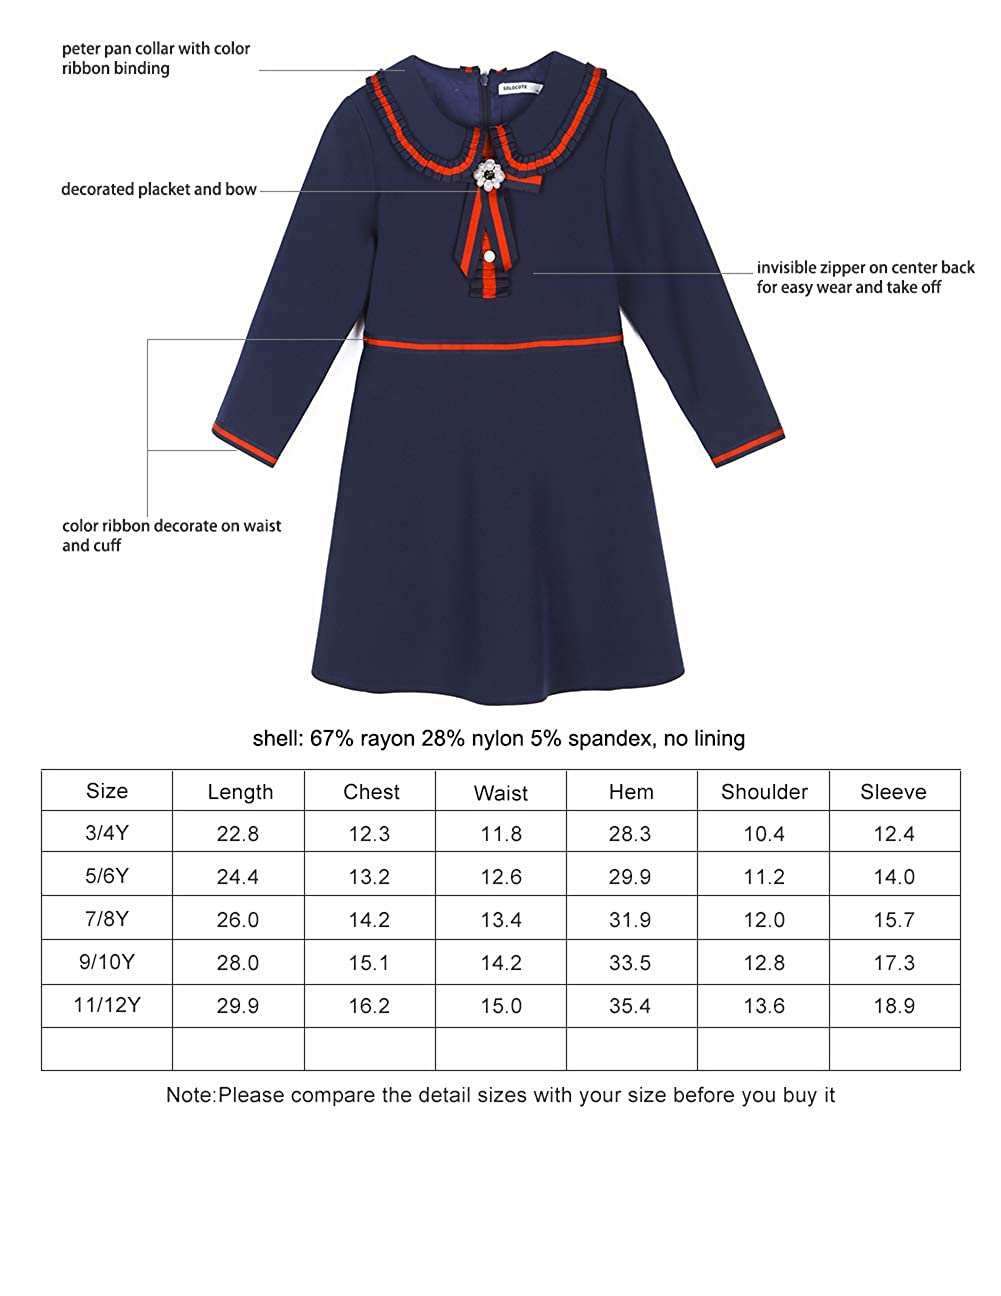 SOLOCOTE Kids Girls School Uniform Jumper Dress Pleated Peter Pan Sundress 3-12Y